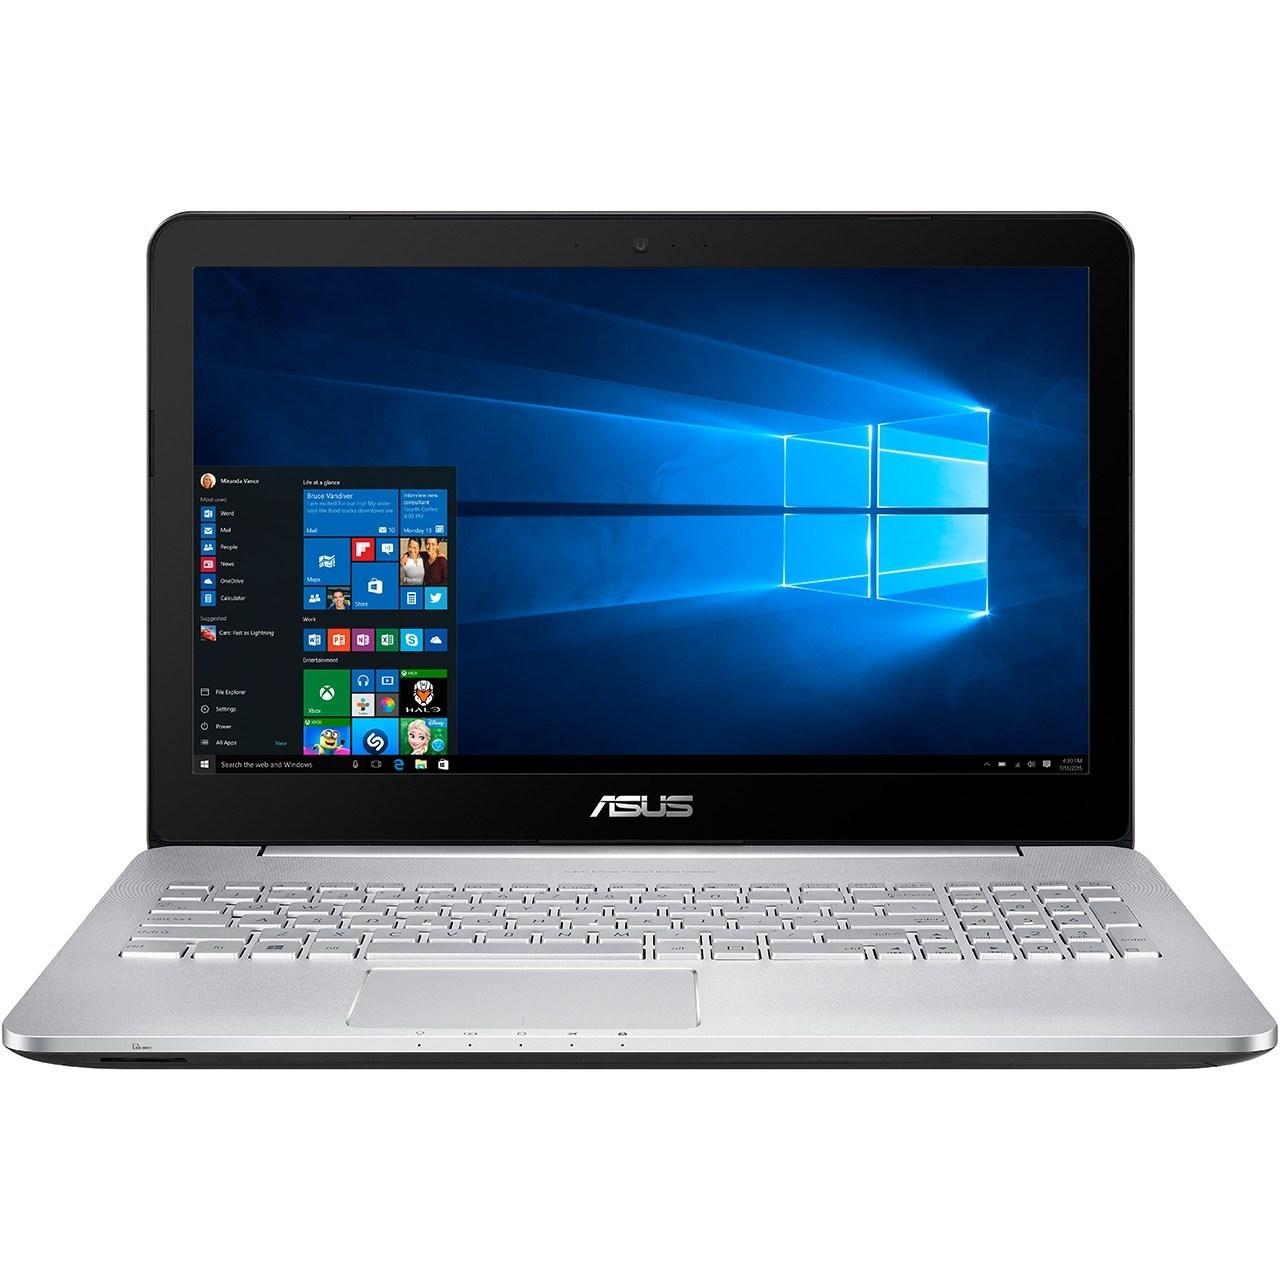 لپ تاپ 15 اینچی ایسوس مدل N552VW - G